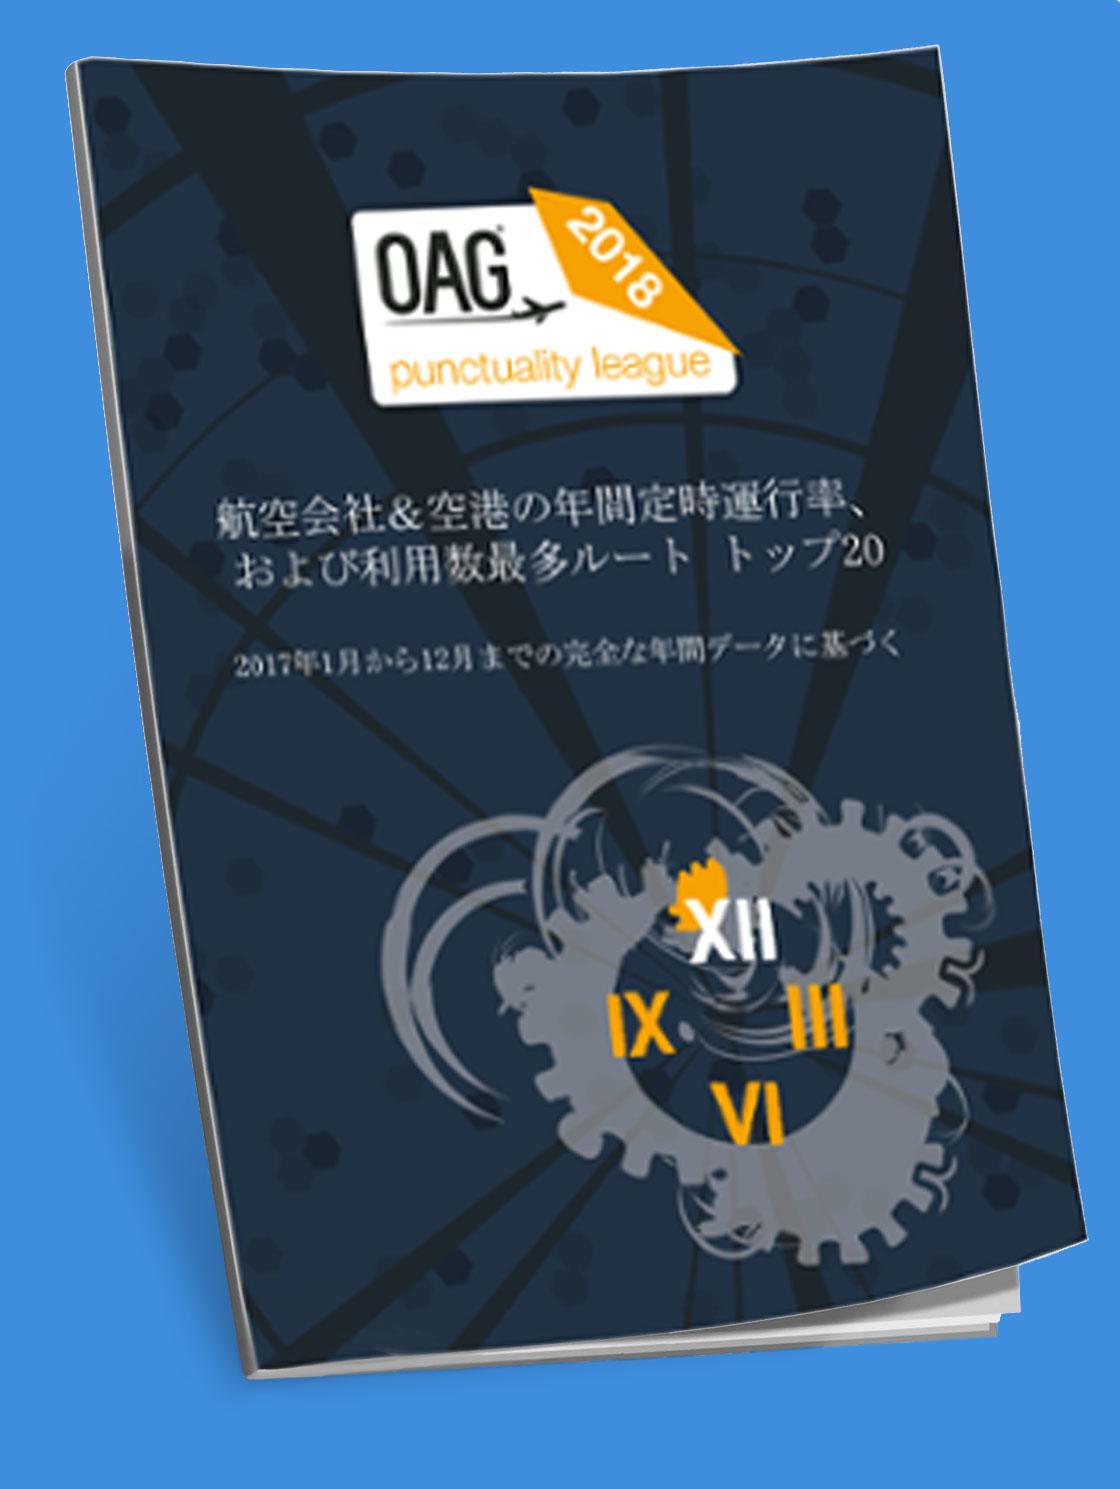 japanese-pleague-bluebg.jpg